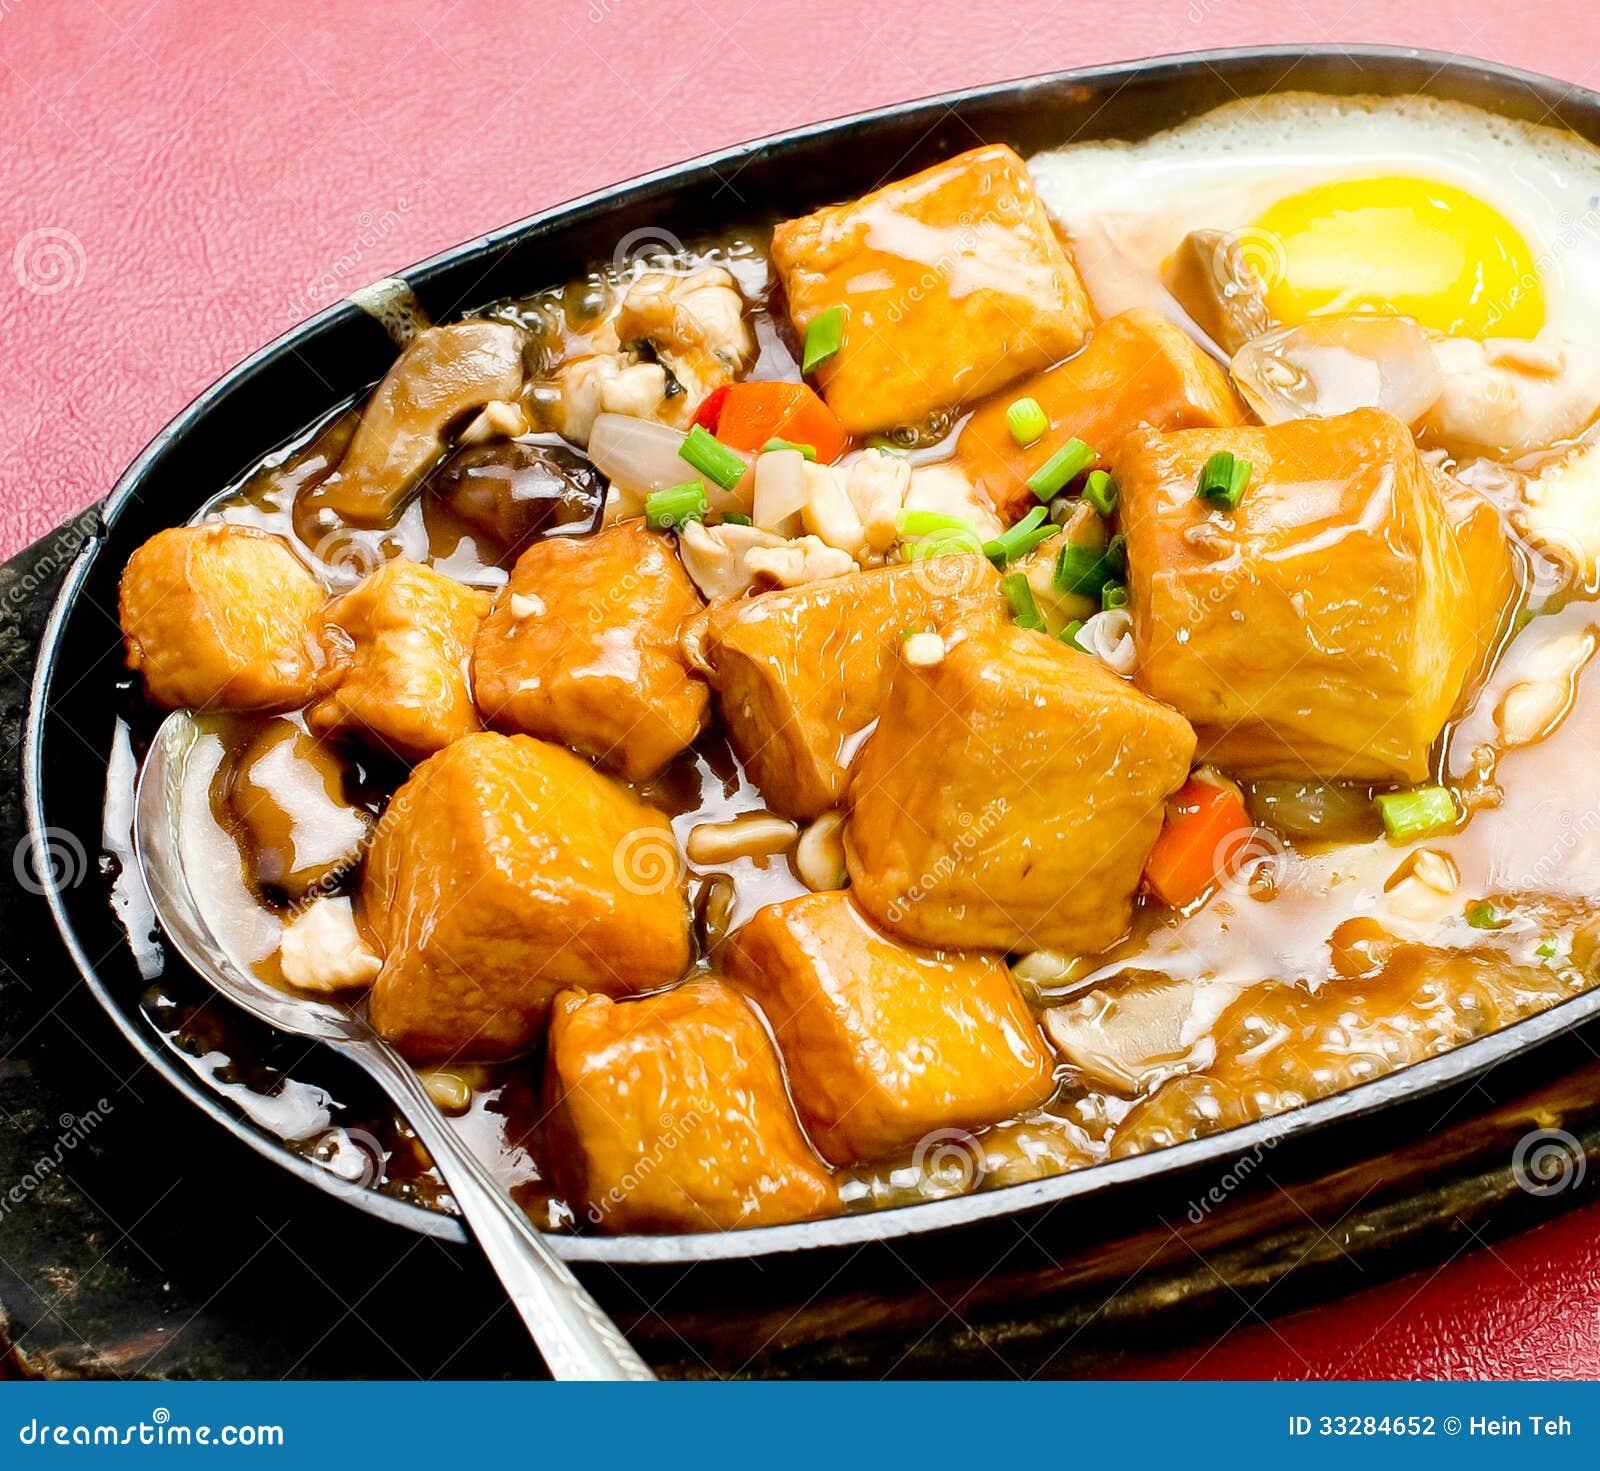 Tofu Home Style Bean Curd Chinese Cuisine